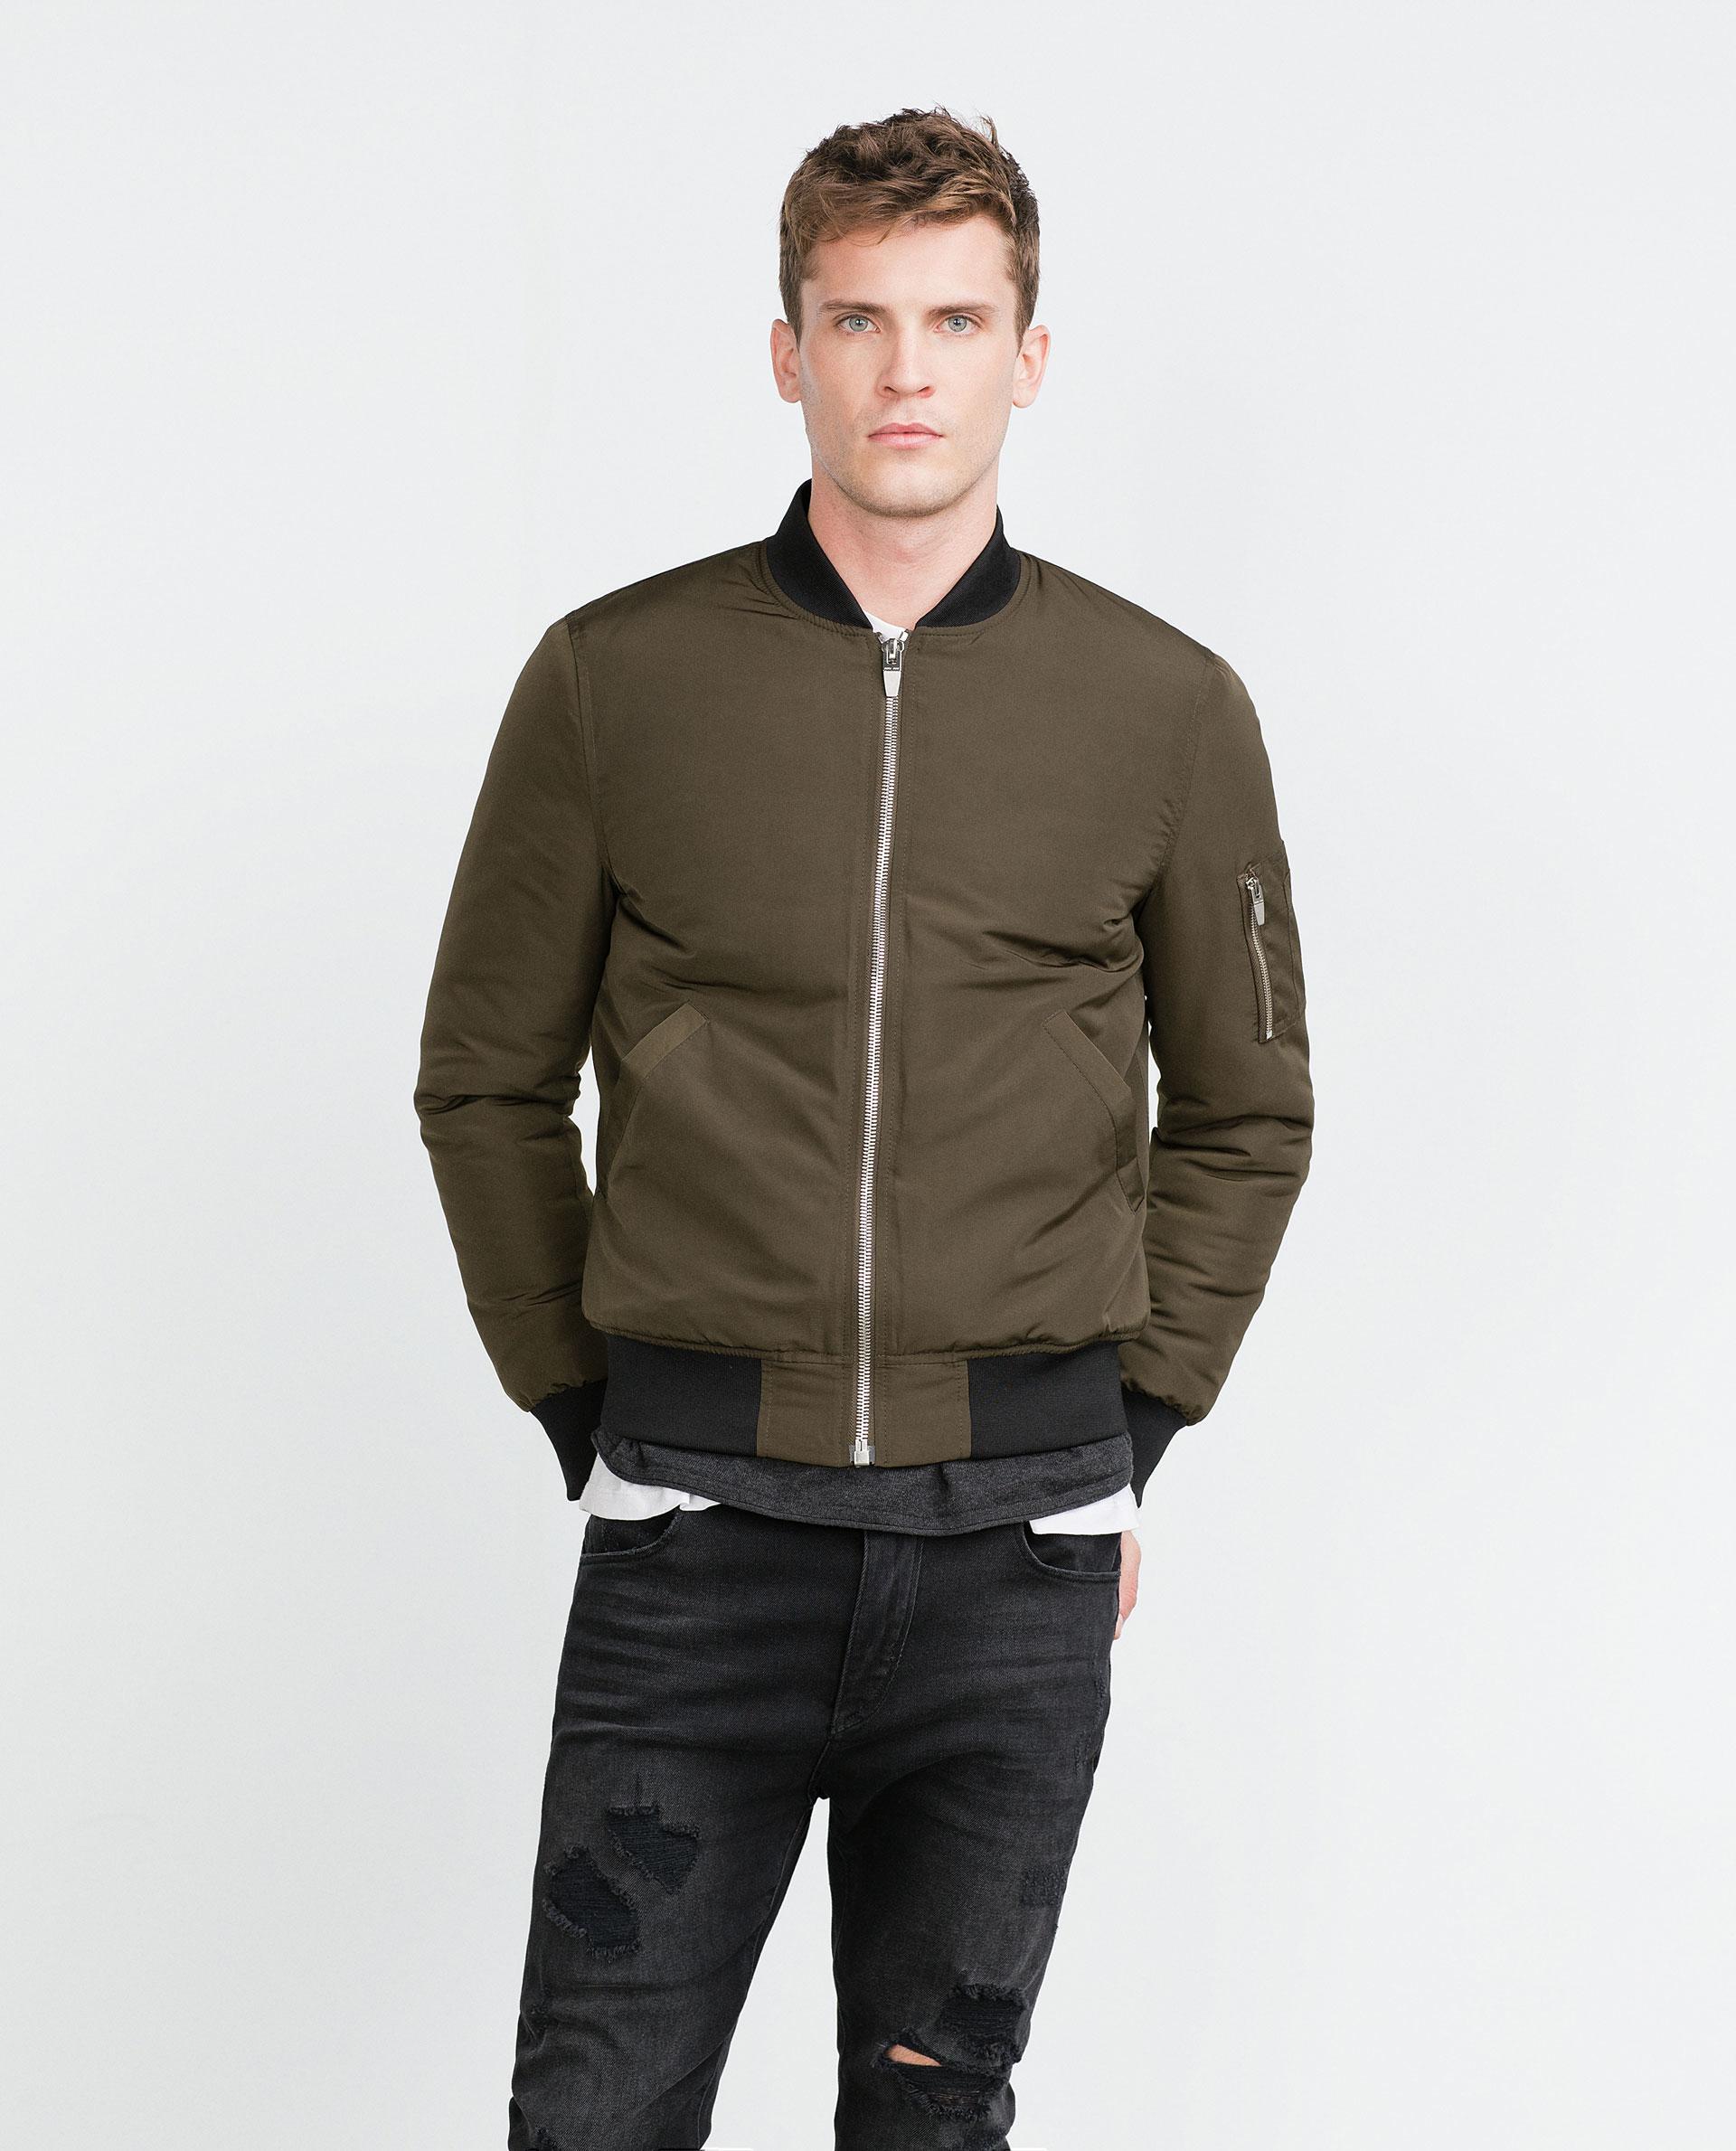 Zara Bomber Jacket In Natural For Men | Lyst